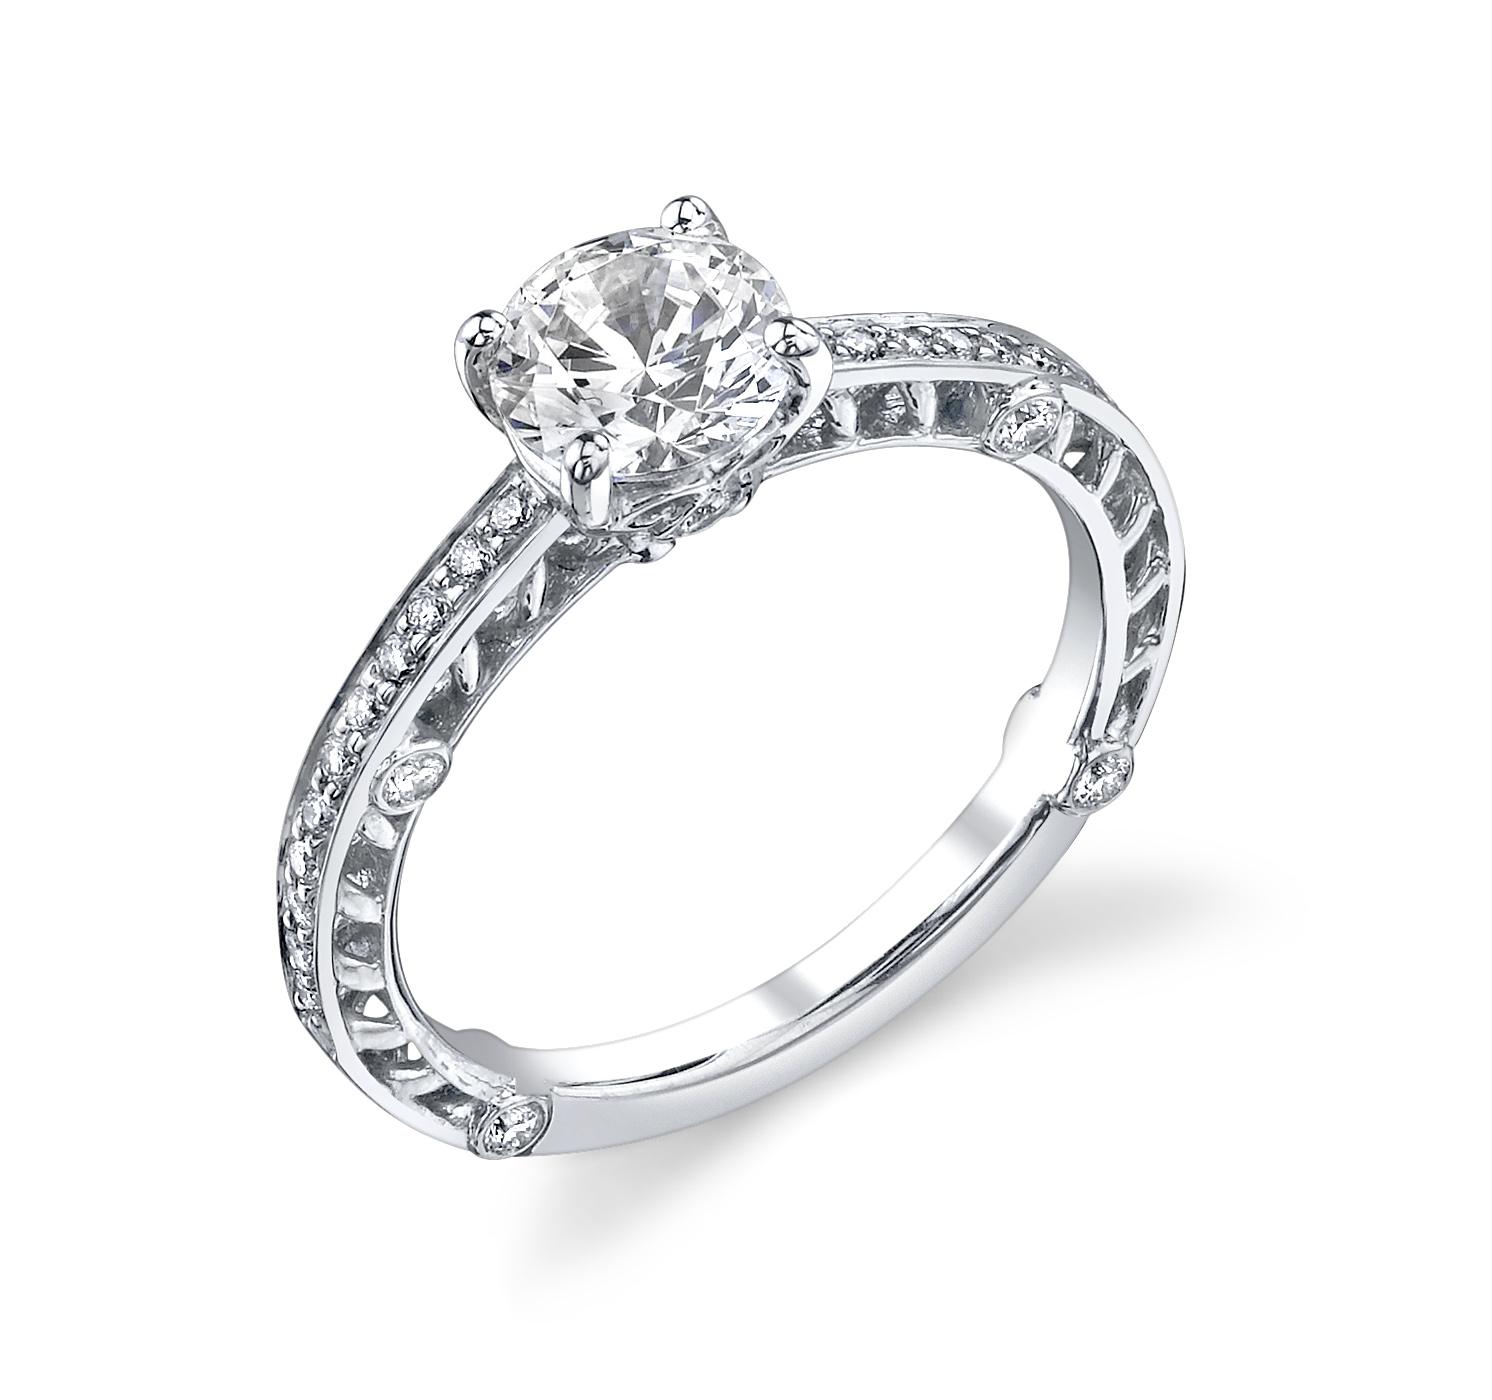 Designer Spotlight | Robbins Brothers Engagement Rings, Proposals ...